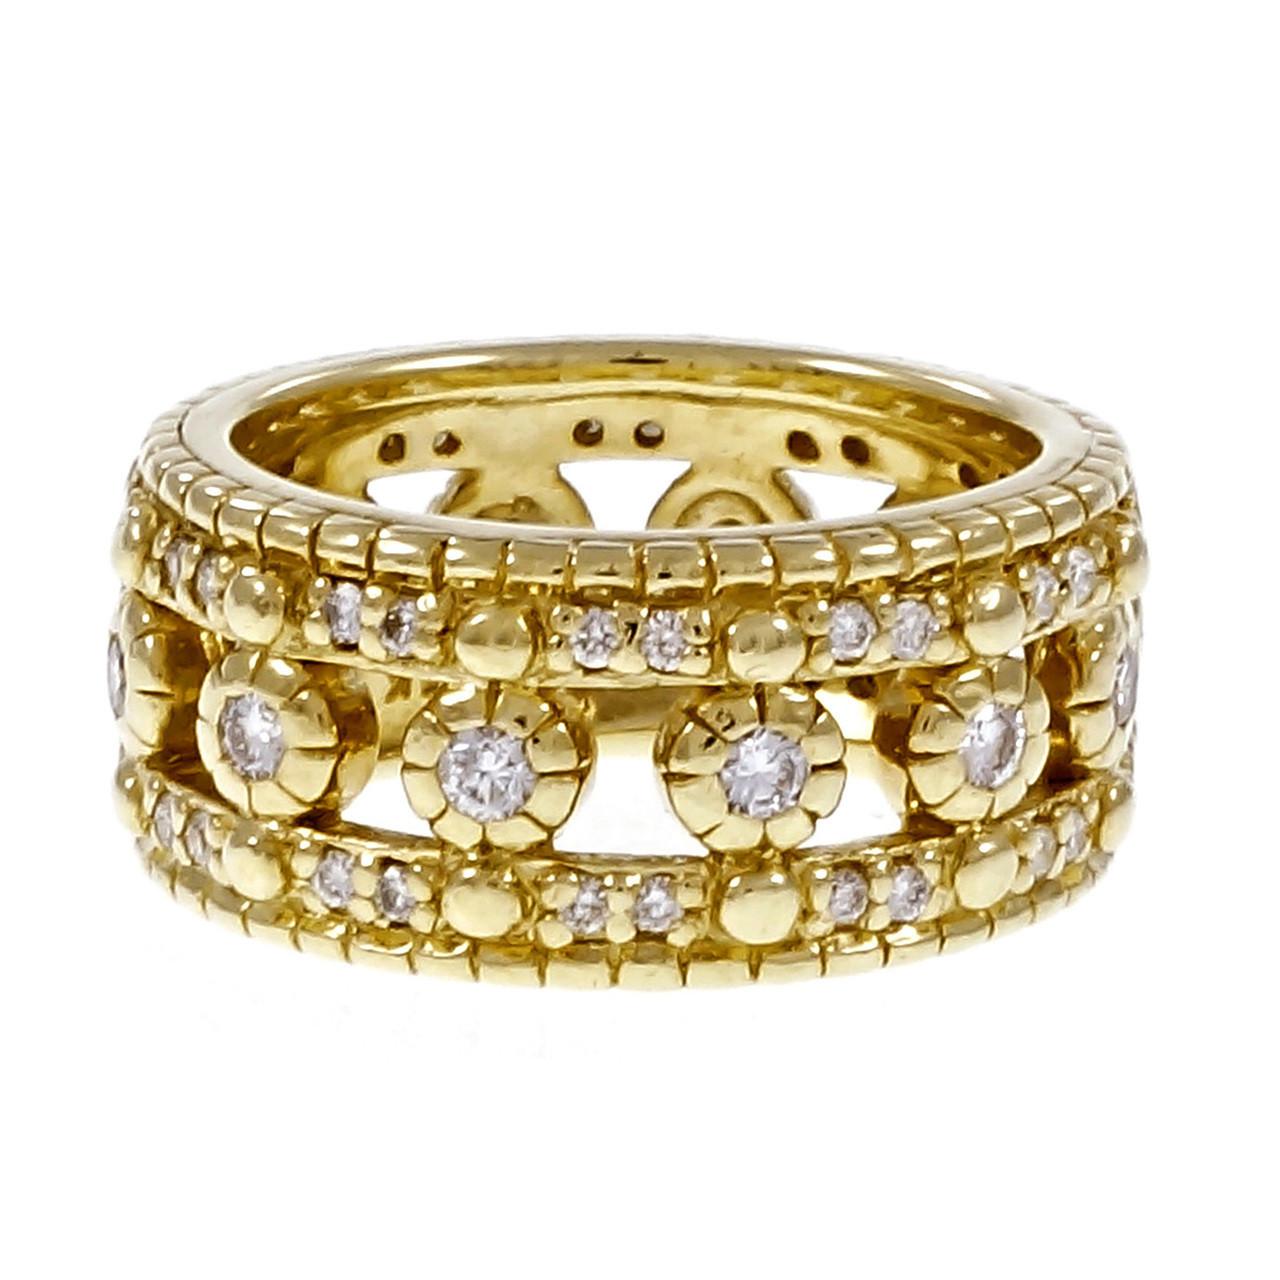 estate judith ripka eternity ring diamond wedding 18k. Black Bedroom Furniture Sets. Home Design Ideas